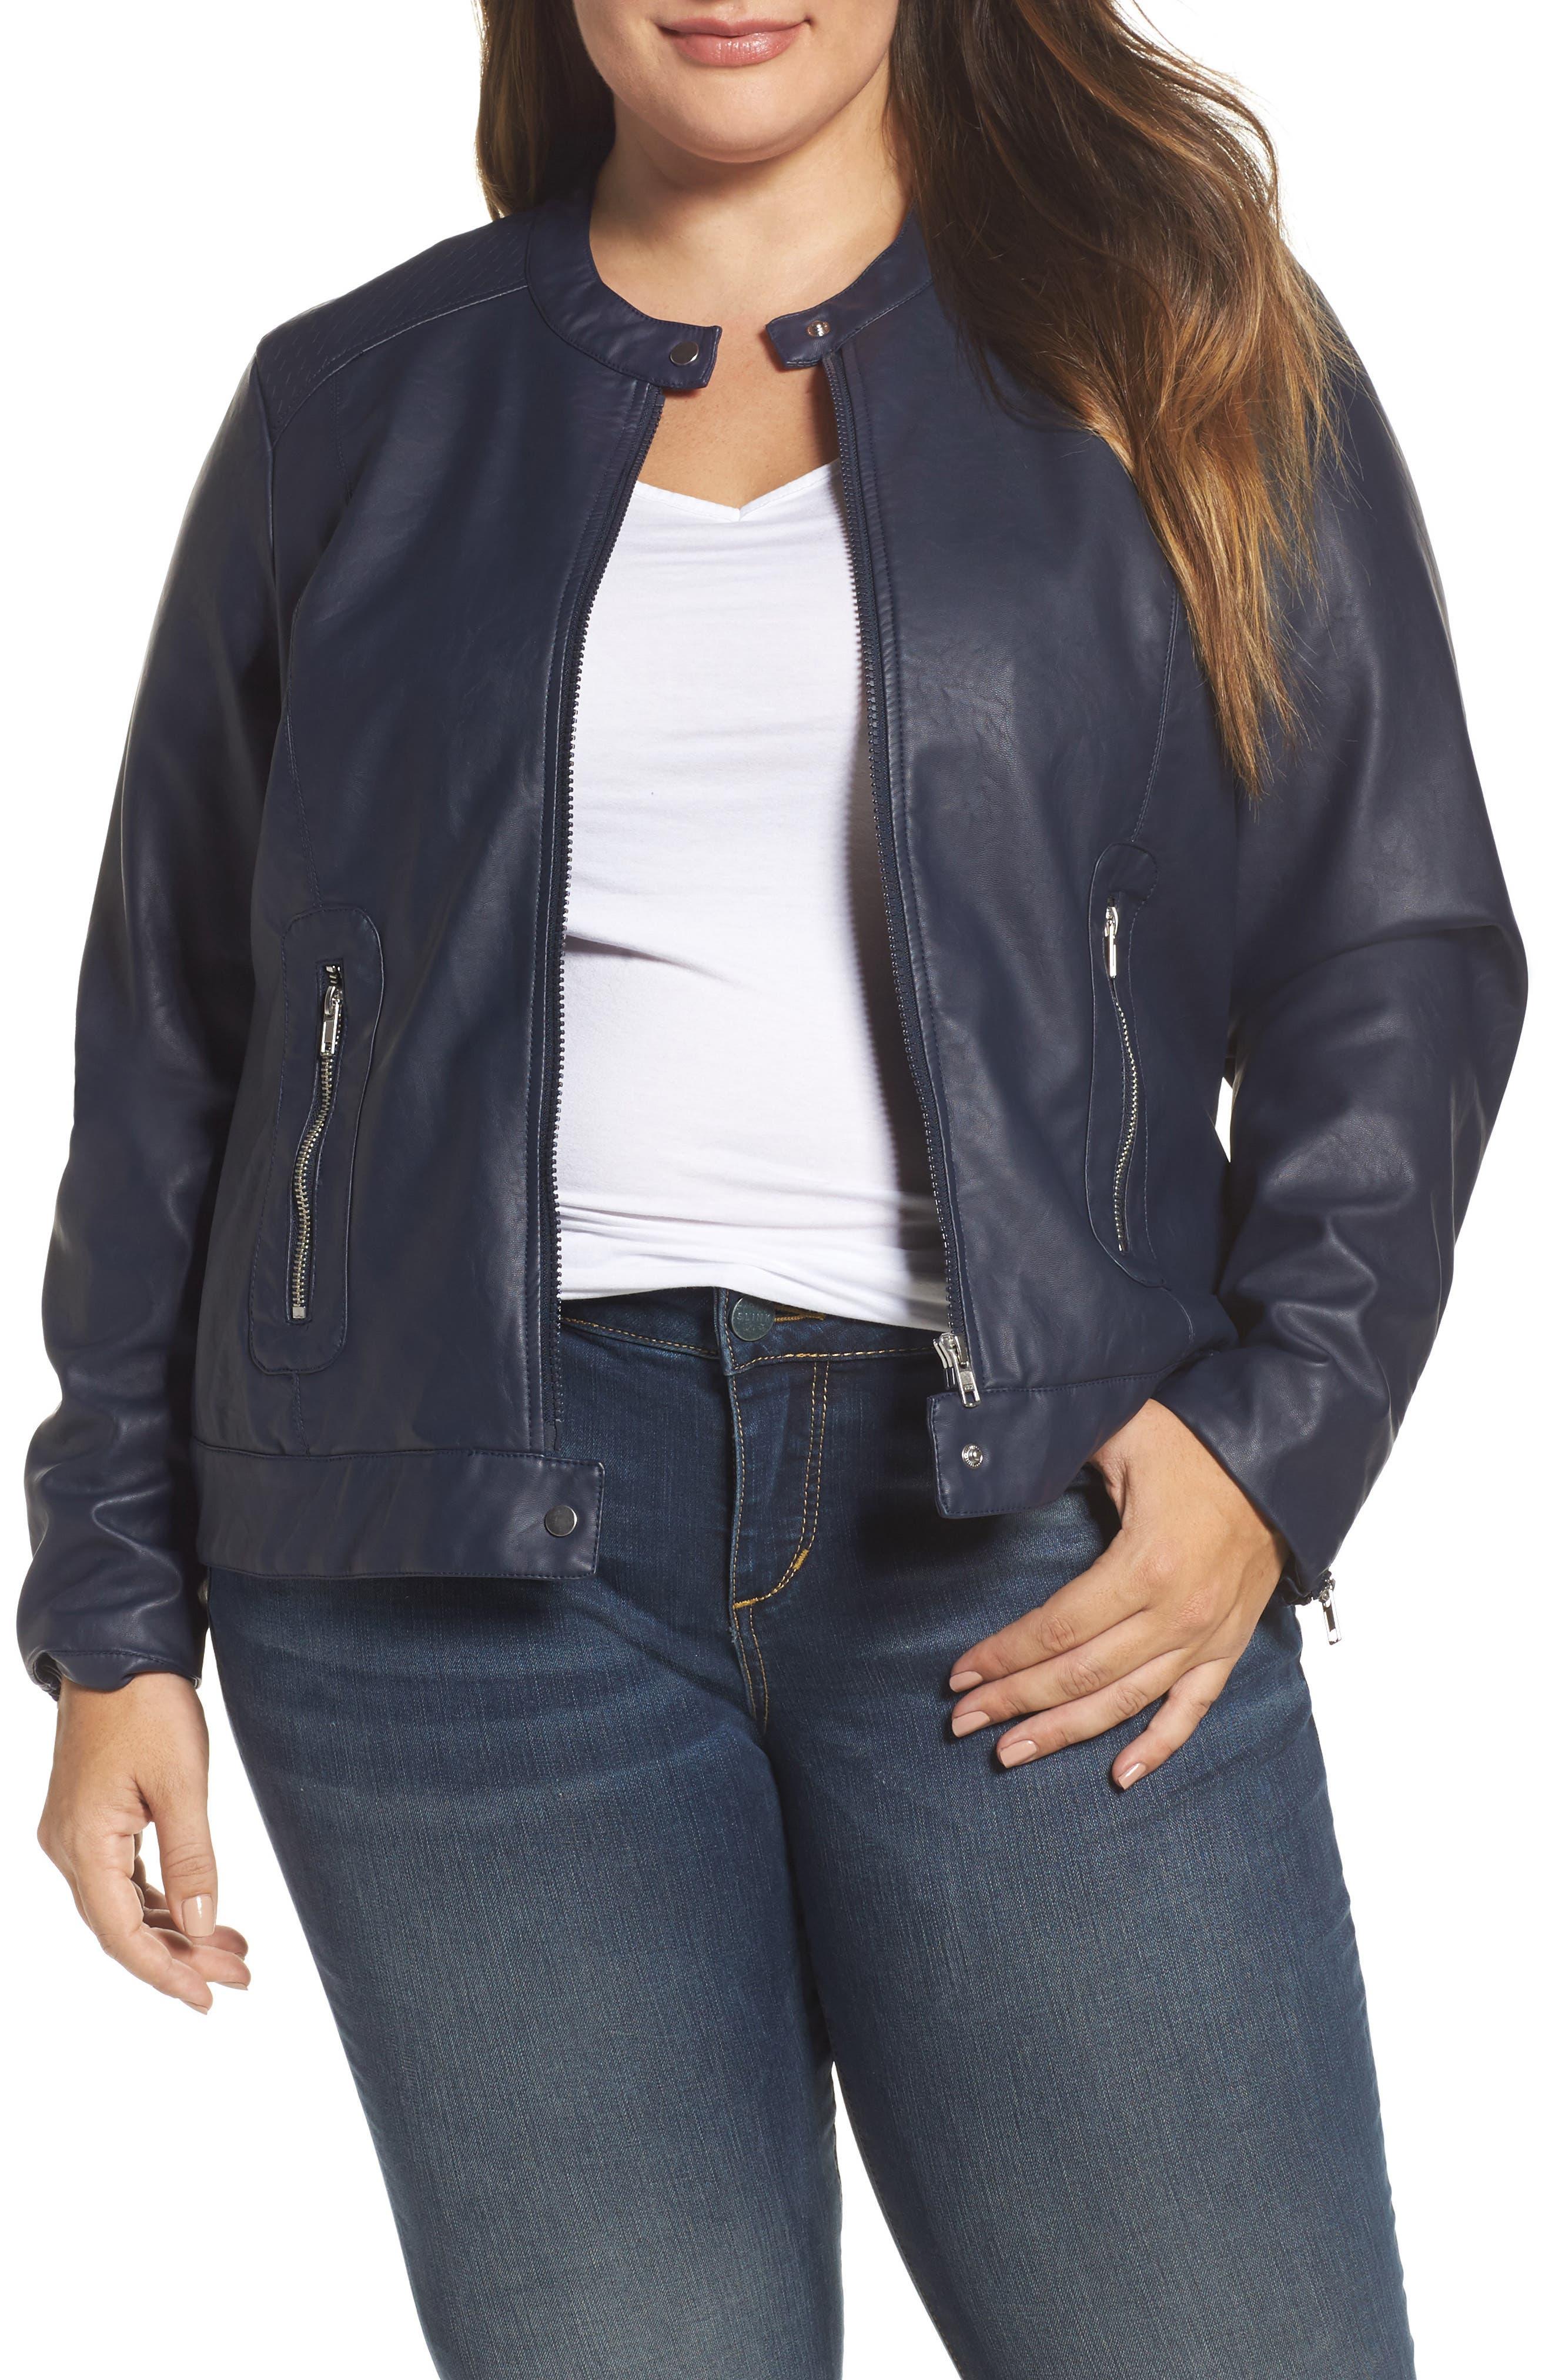 Vava Faux Leather Moto Jacket,                         Main,                         color, Navy Blazer